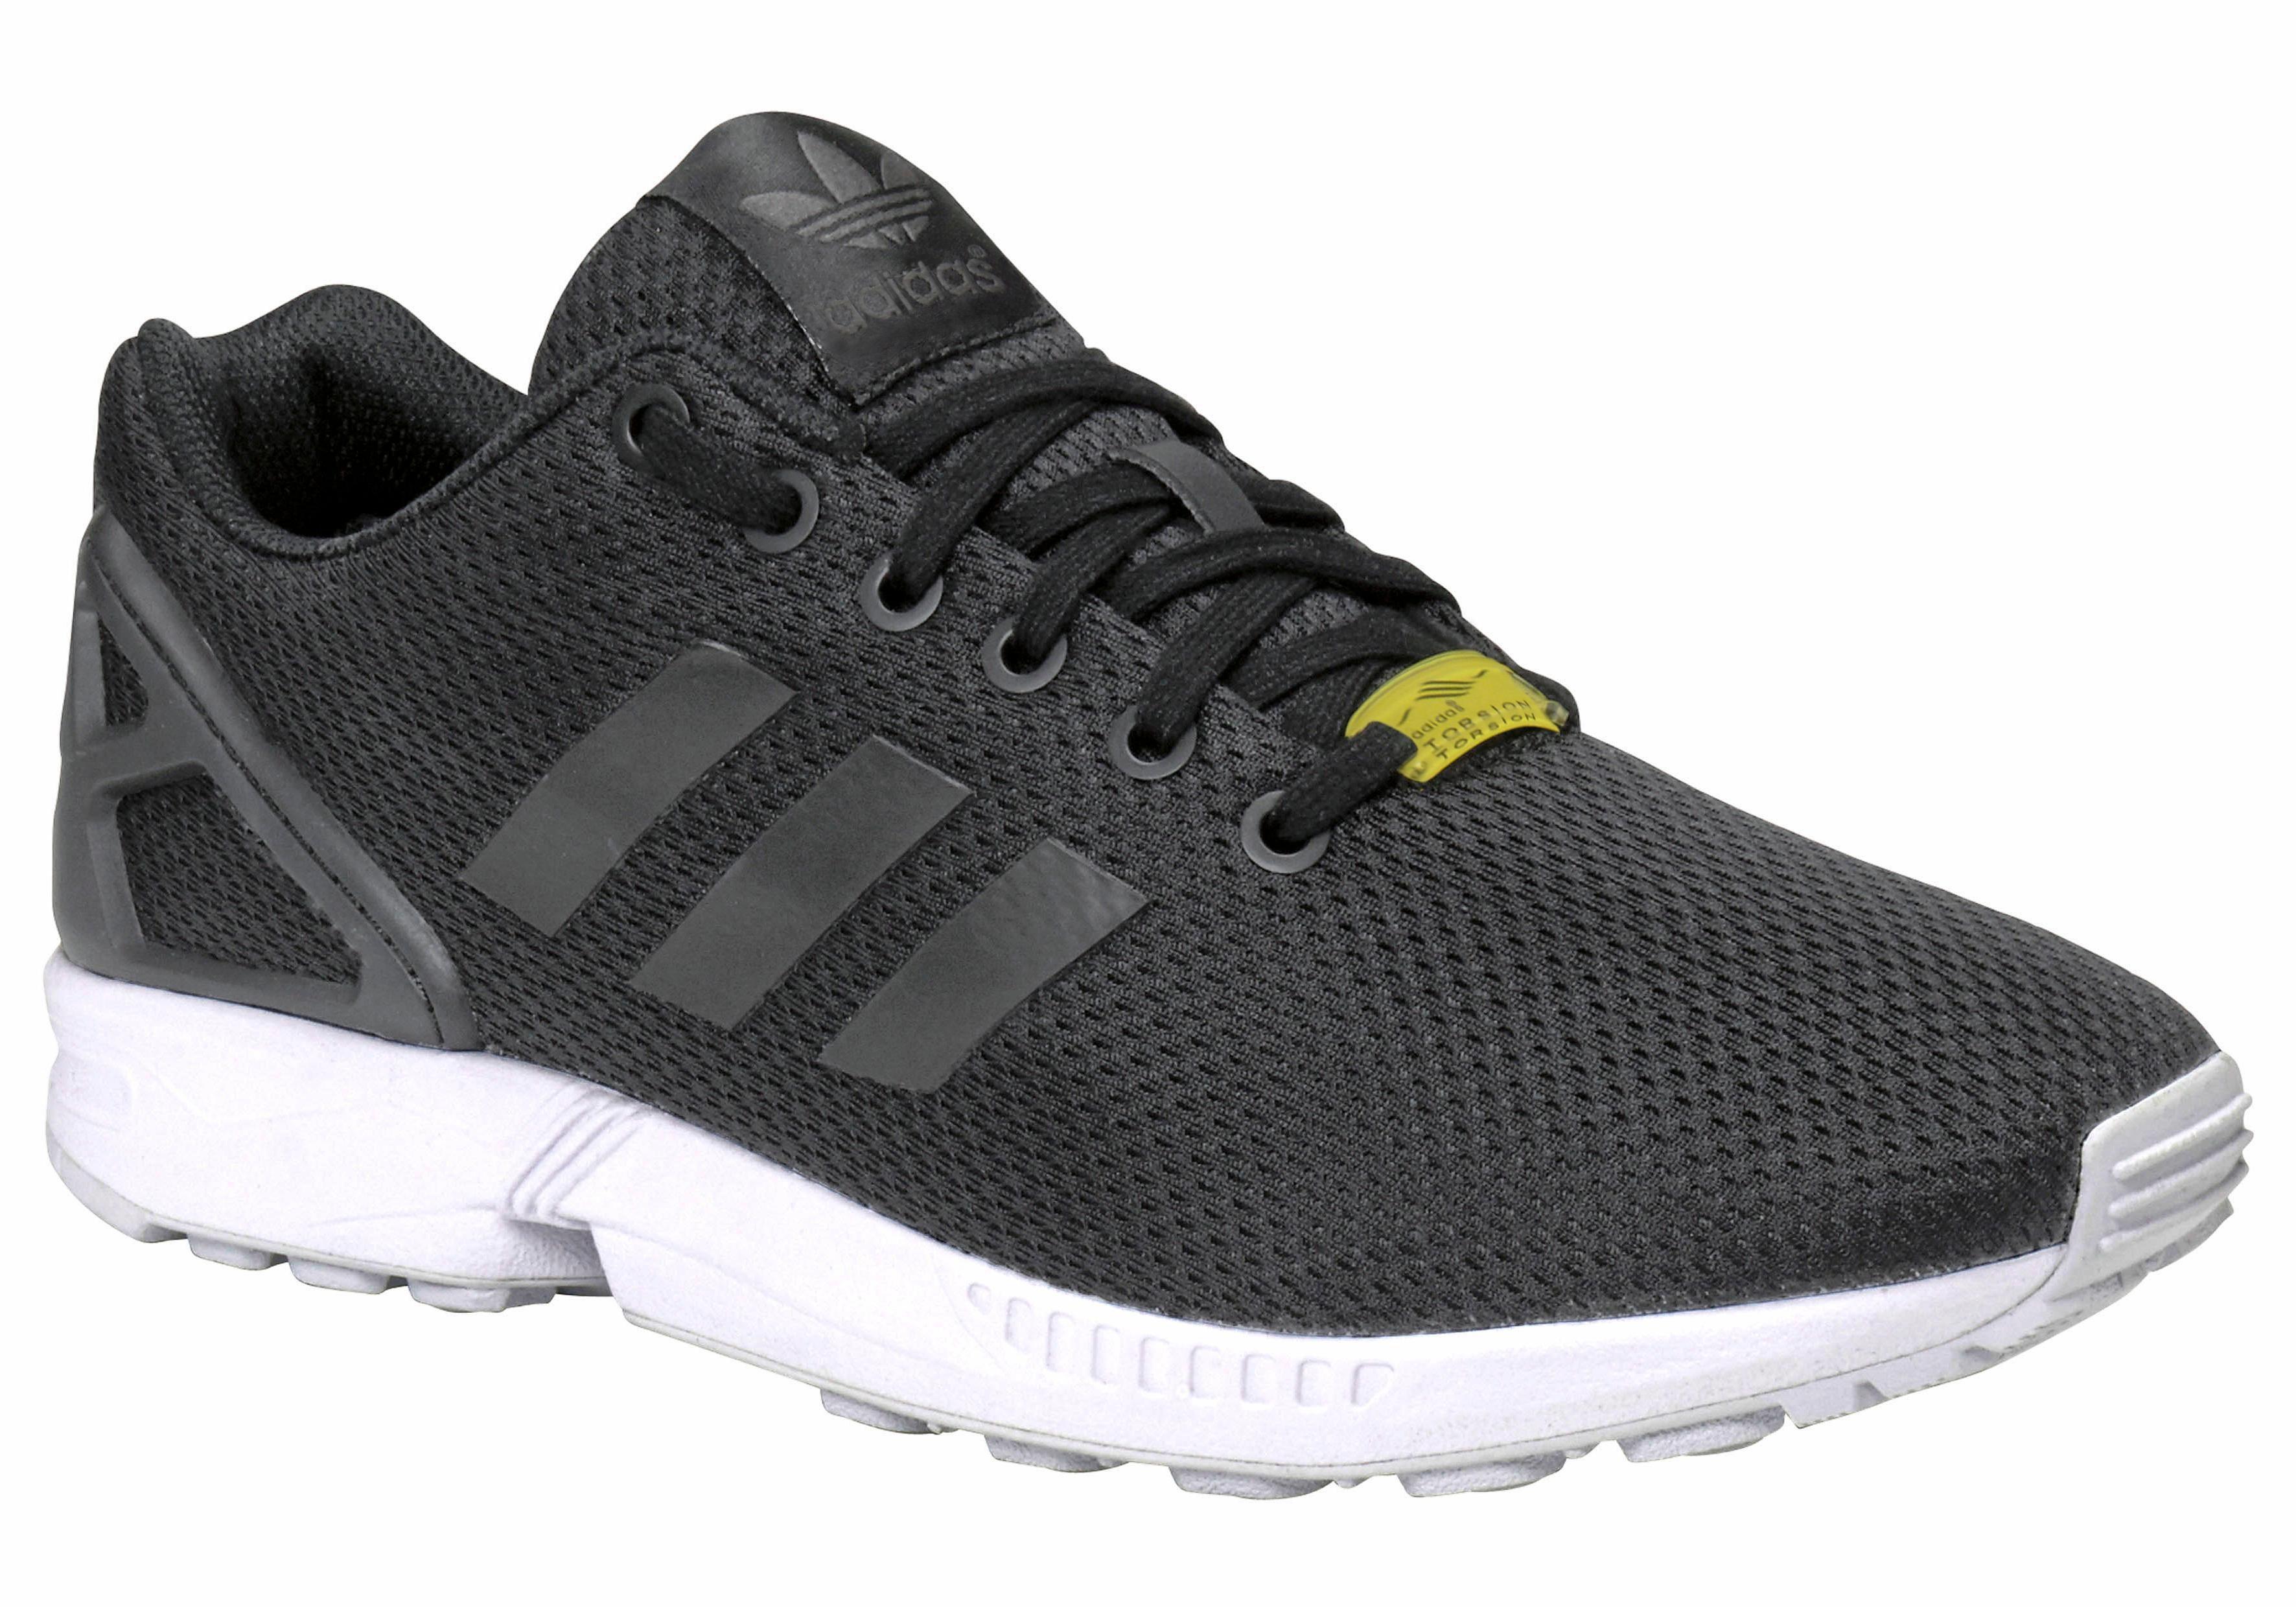 Adidas Zx Flux 2019 Adidas Schoenen Nederland goedkope